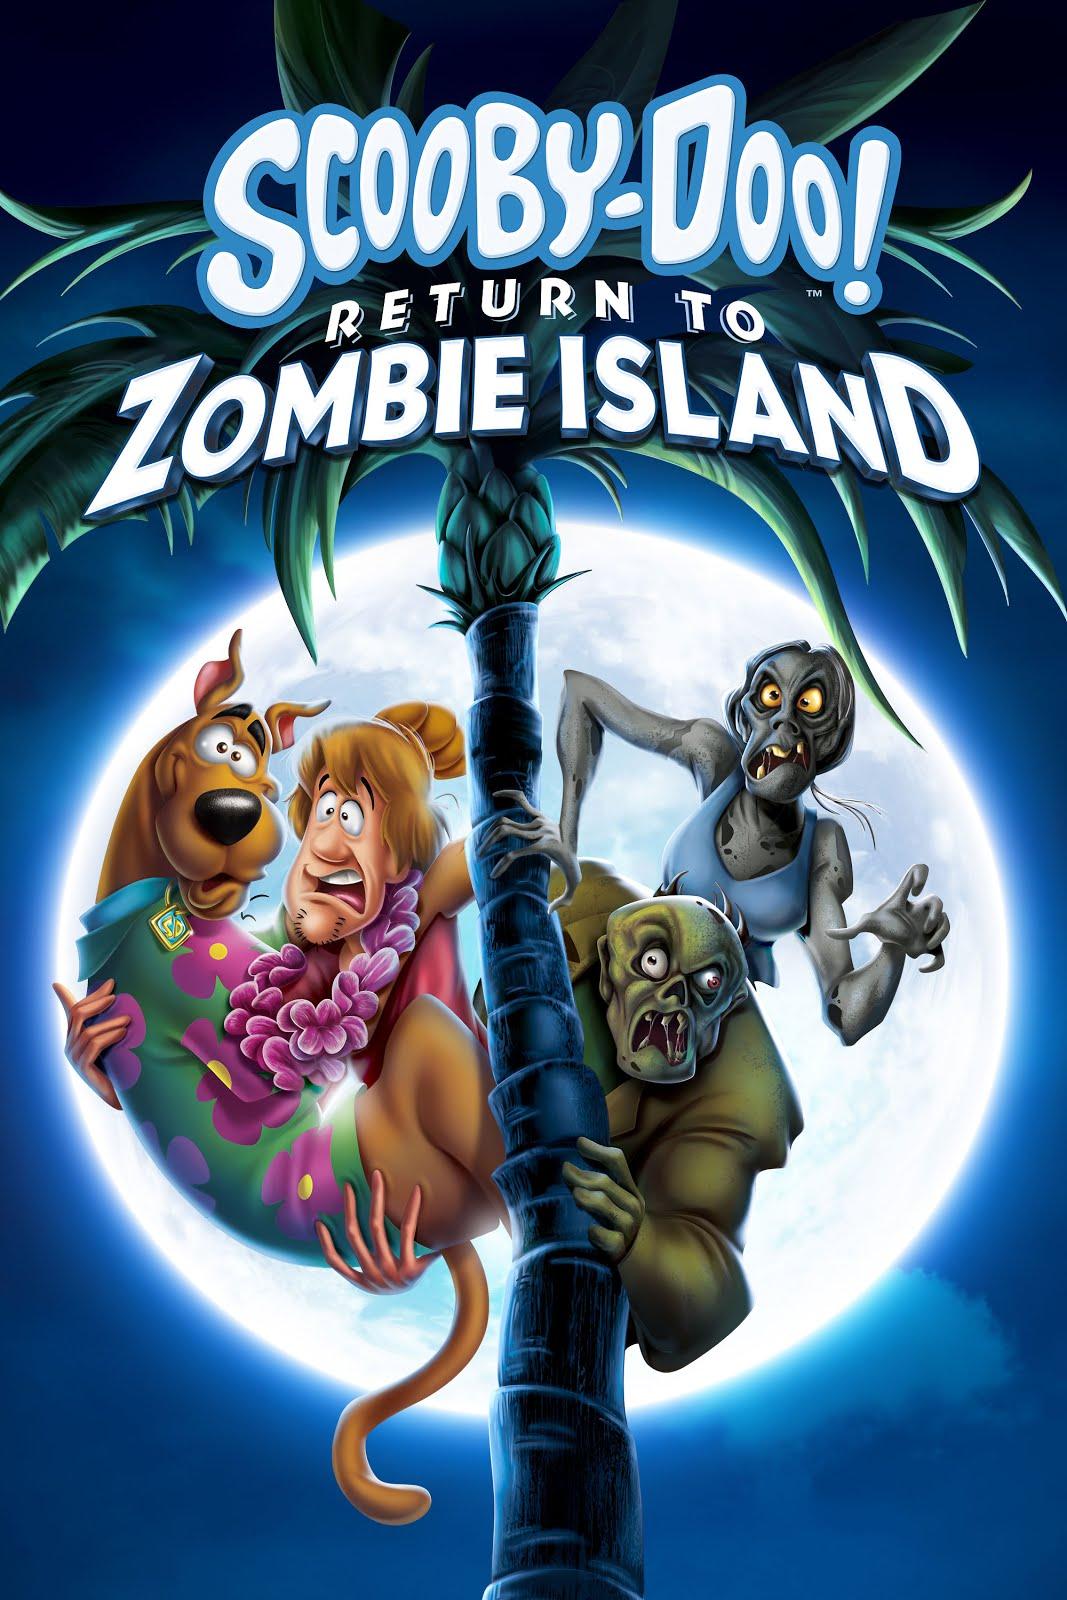 Scooby Doo: Return to Zombie Island (2019) English WEB-DL 720p 700MB